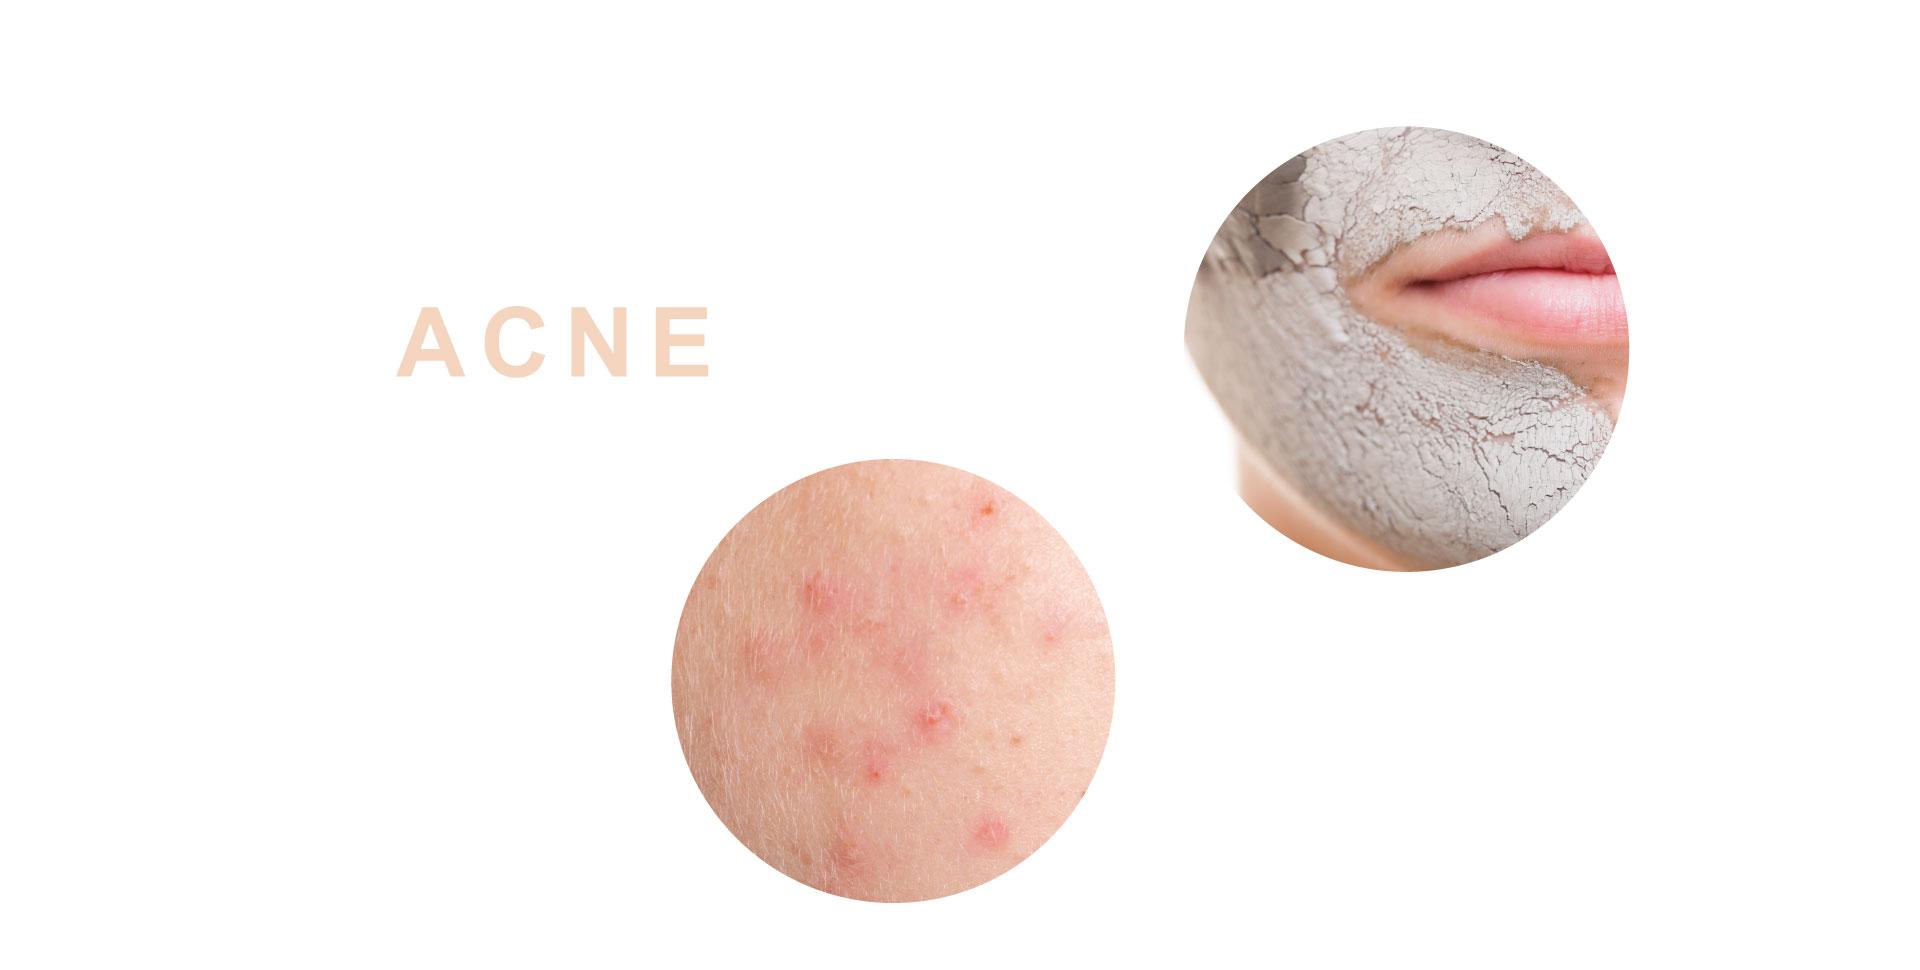 acne-behandeling-schoonheidsspecialiste-tessenderlo-skincare-isabelle